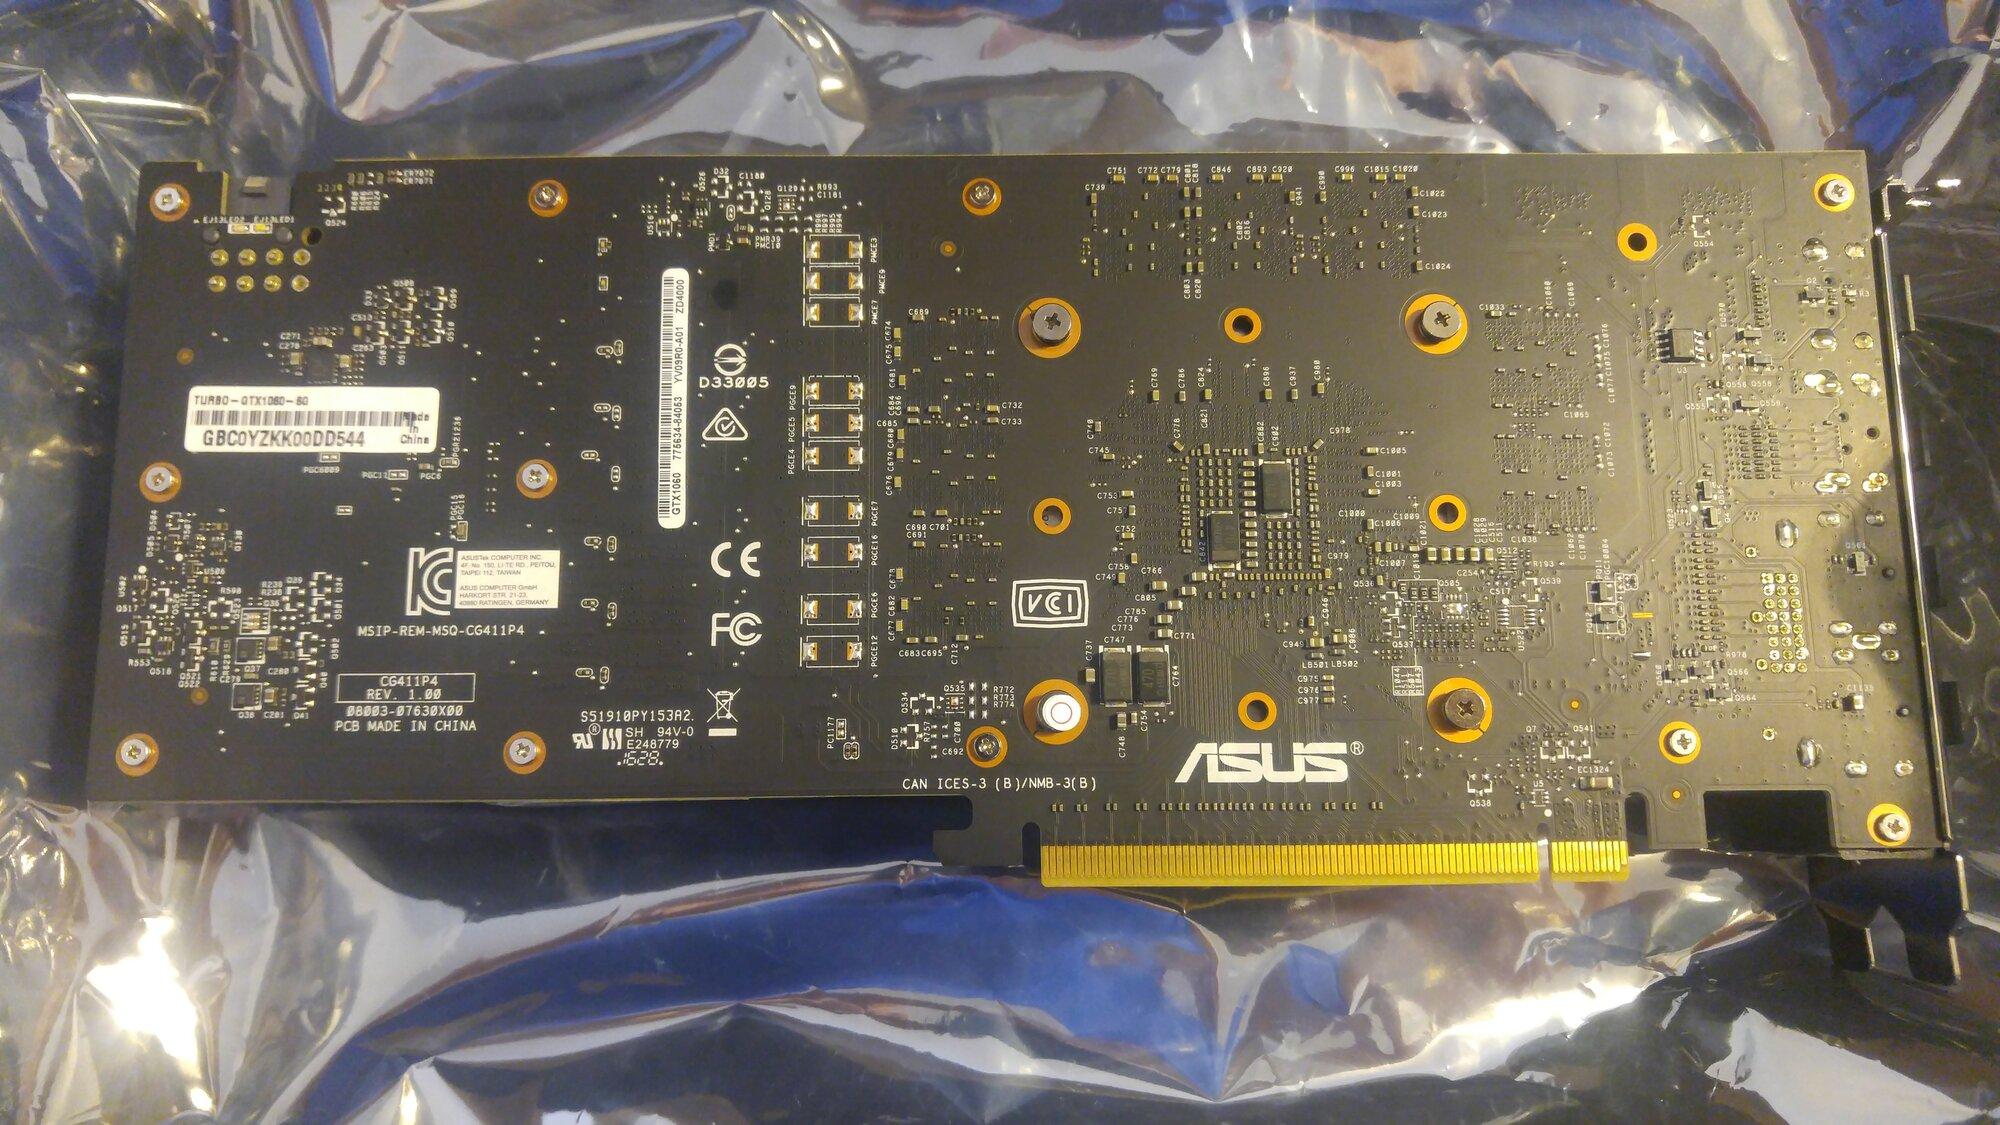 For Sale RMA new Asus GTX 1060 6GB blower style GPU / USED